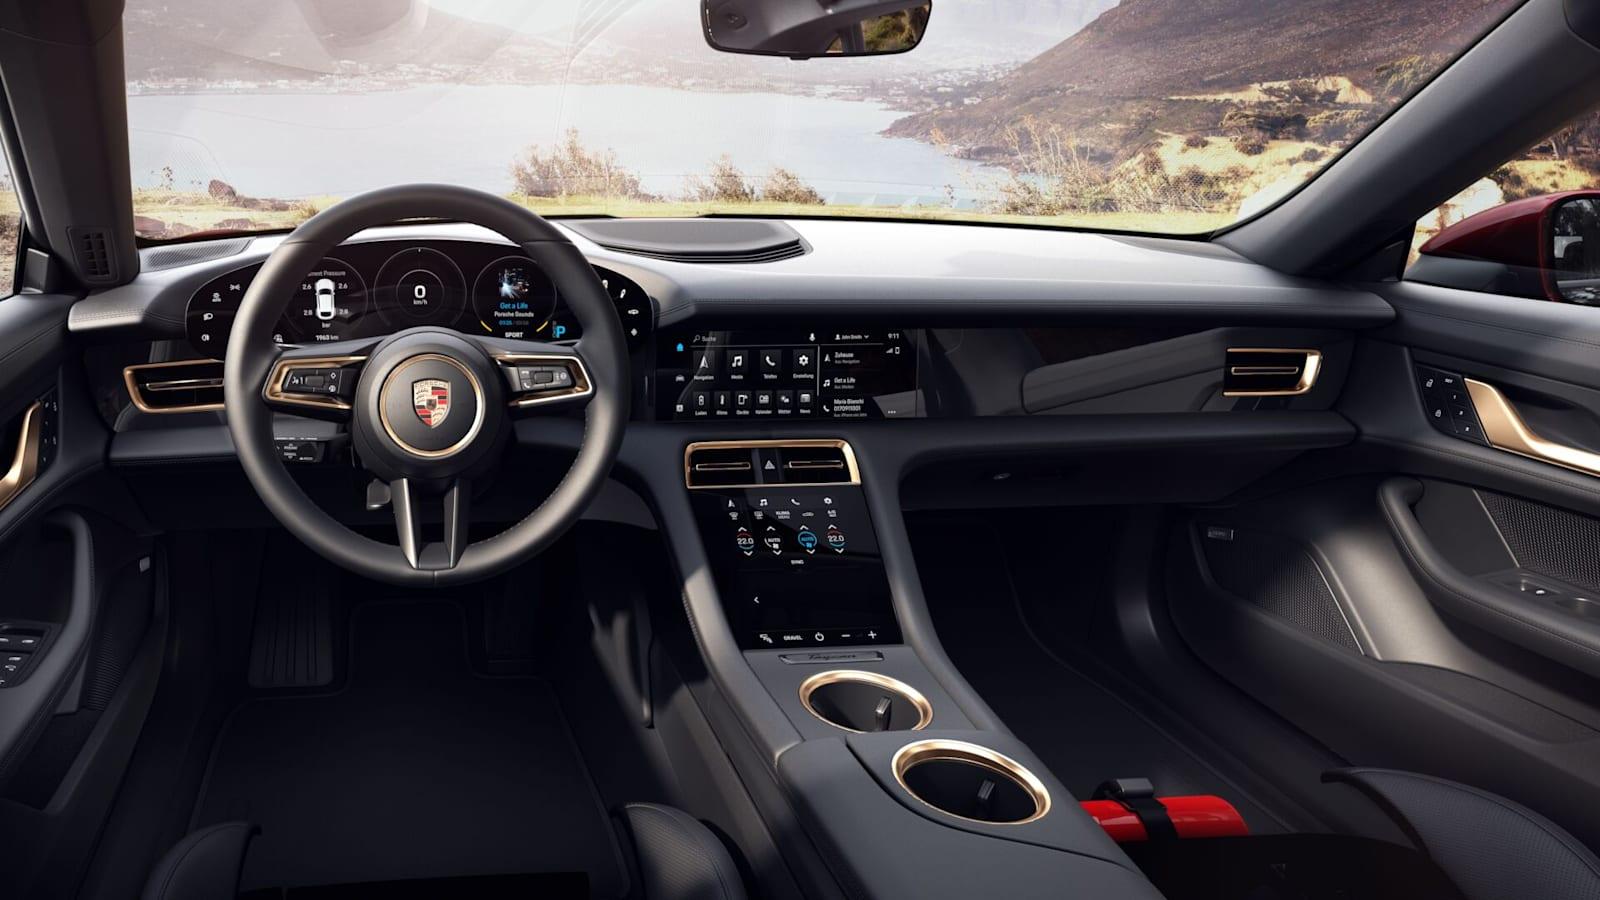 Porsche Taycan 4 Cross Turismo Interior